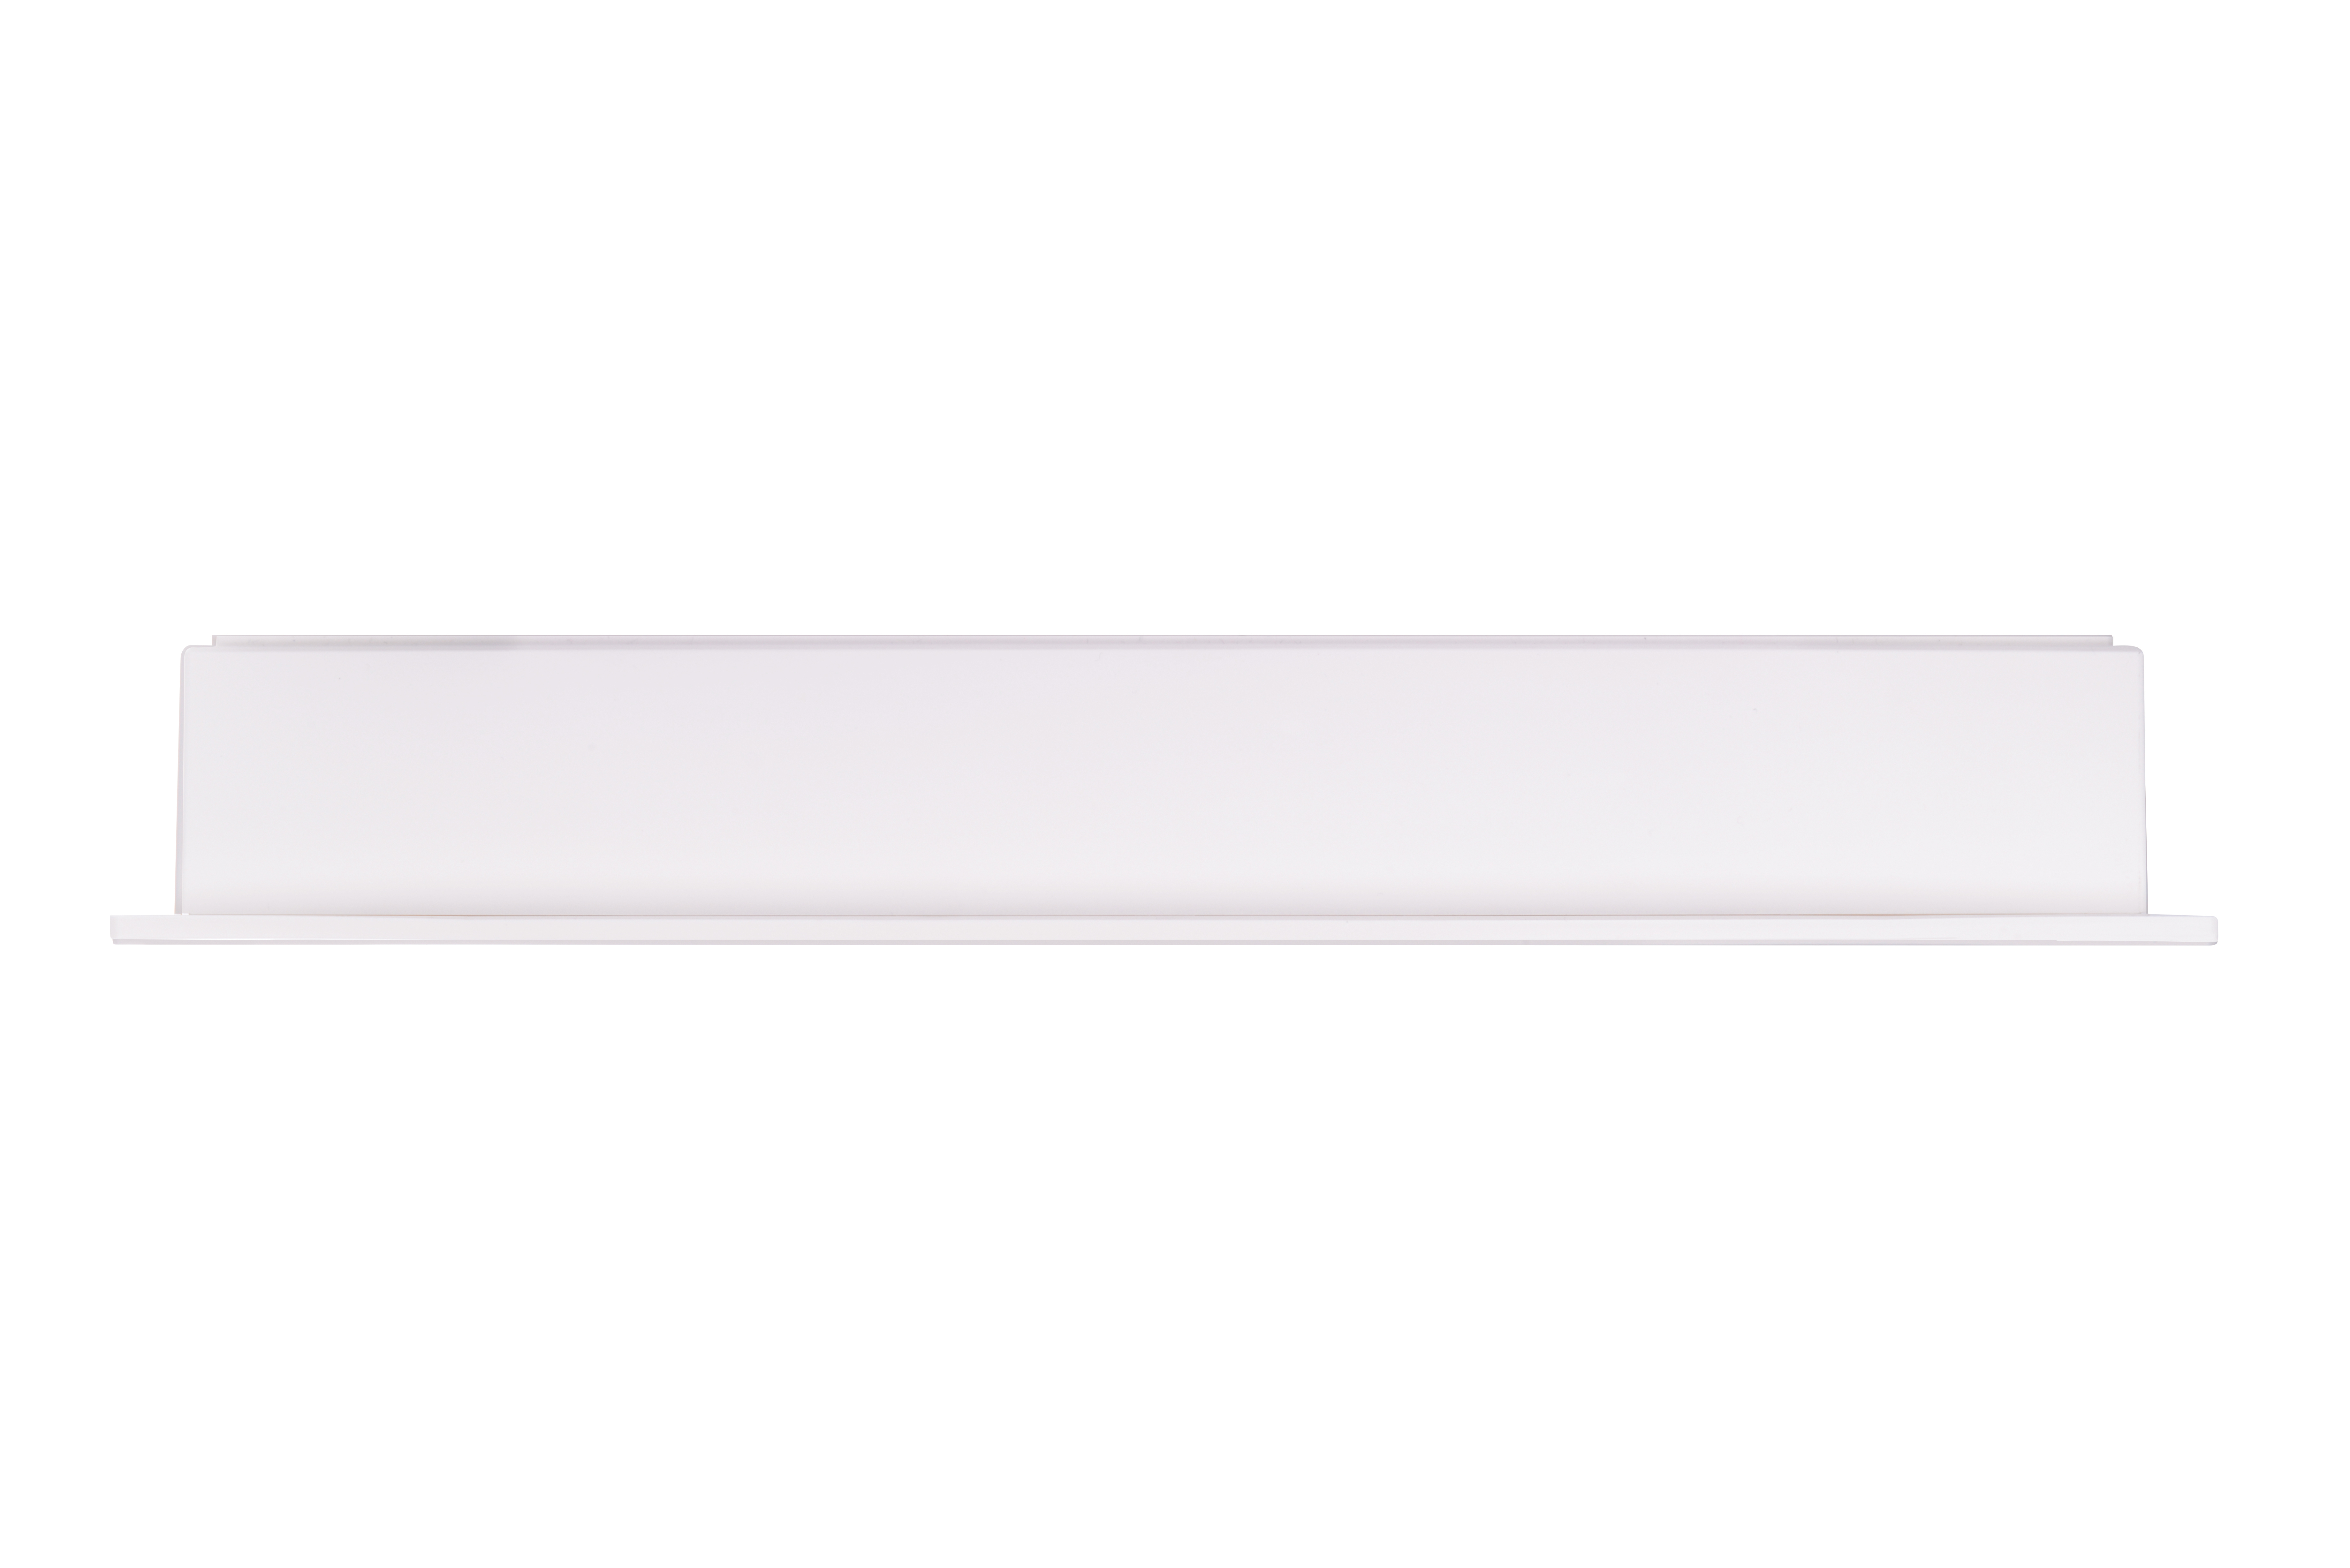 Lampa emergenta led Intelight 94702   3h mentinut test automat 5